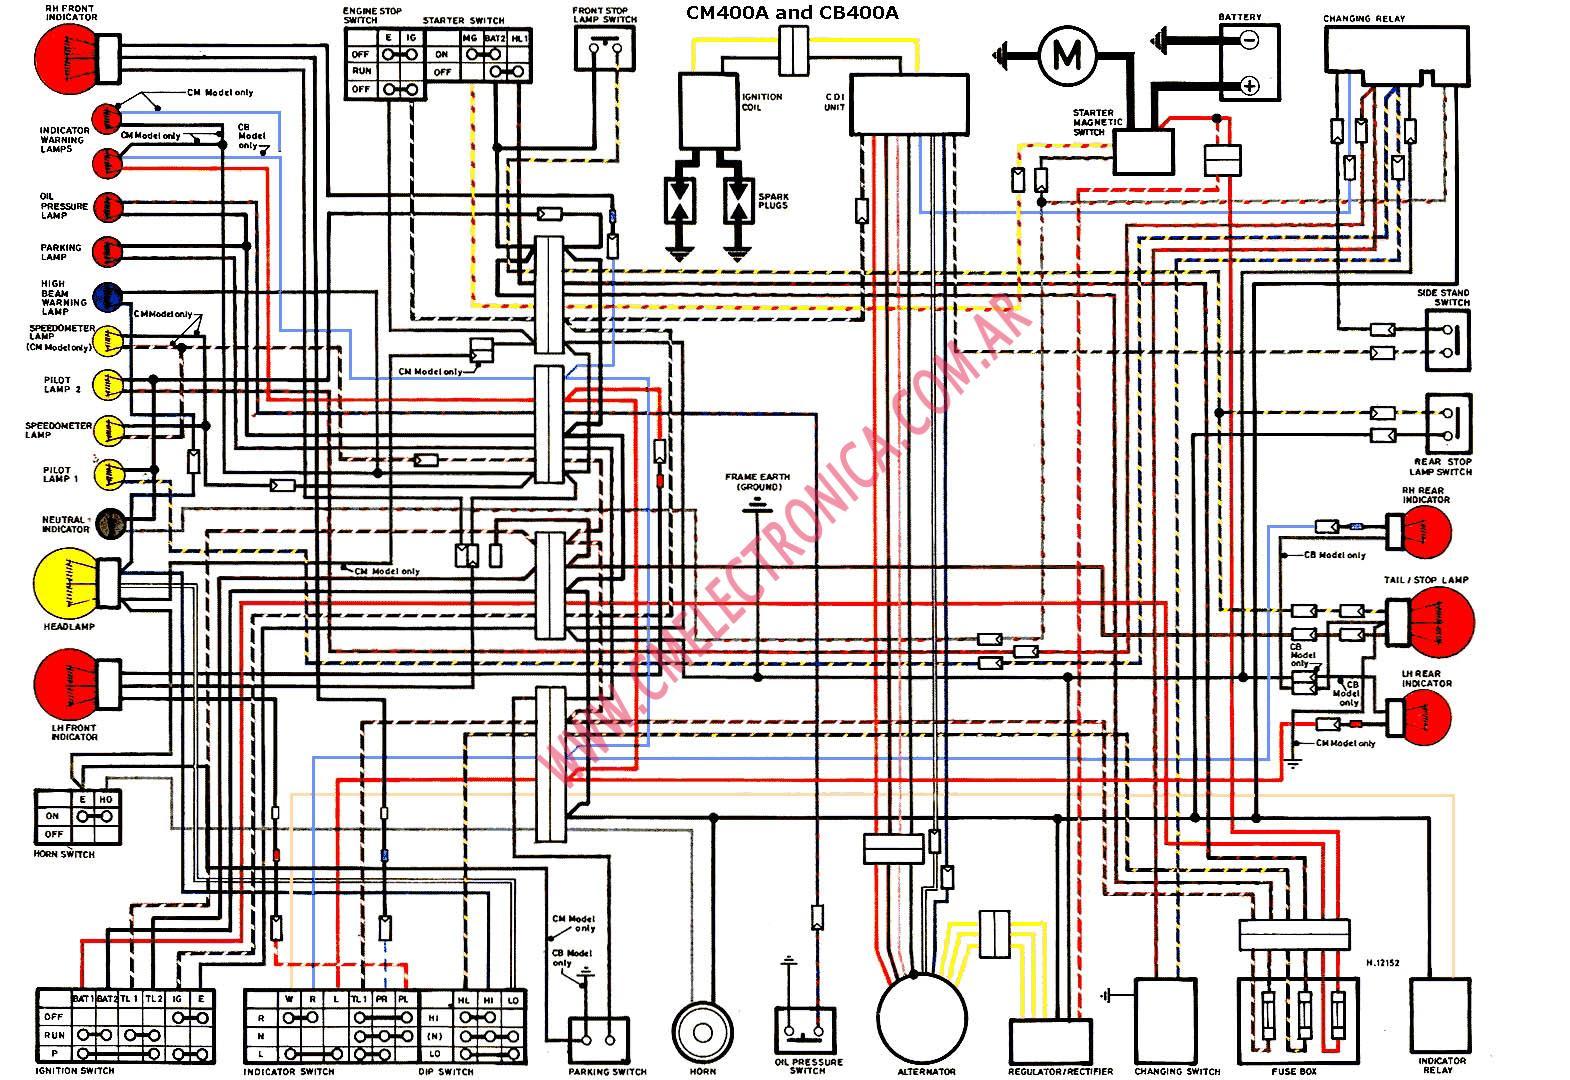 Kawasaki Bayou 400 Electrical Diagram Wiring